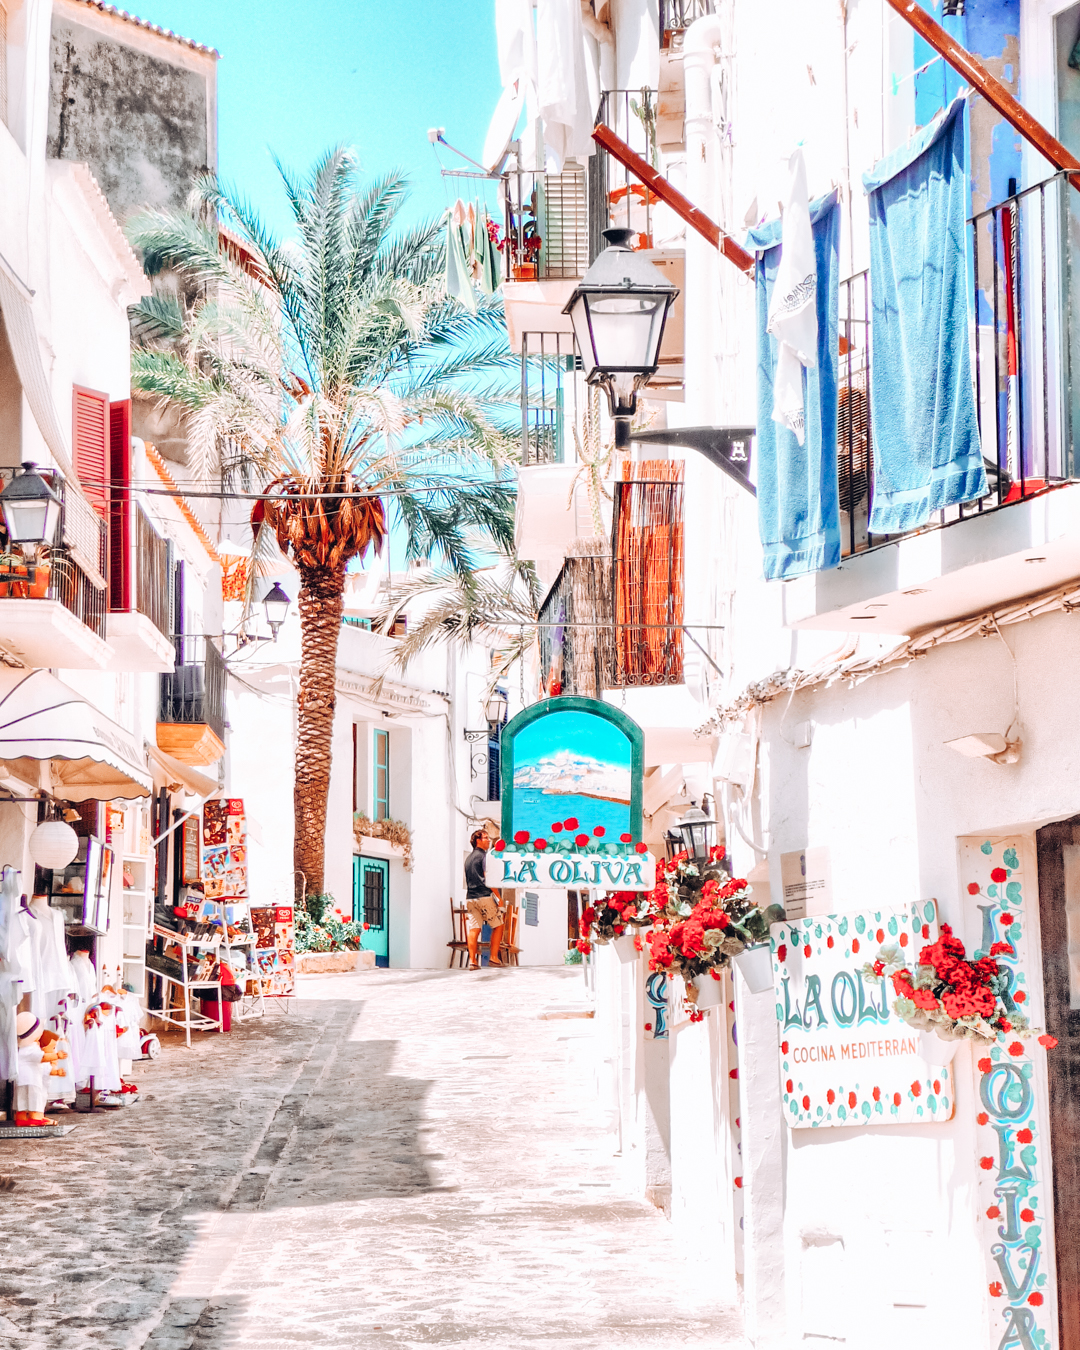 Instagrammable street in Ibiza